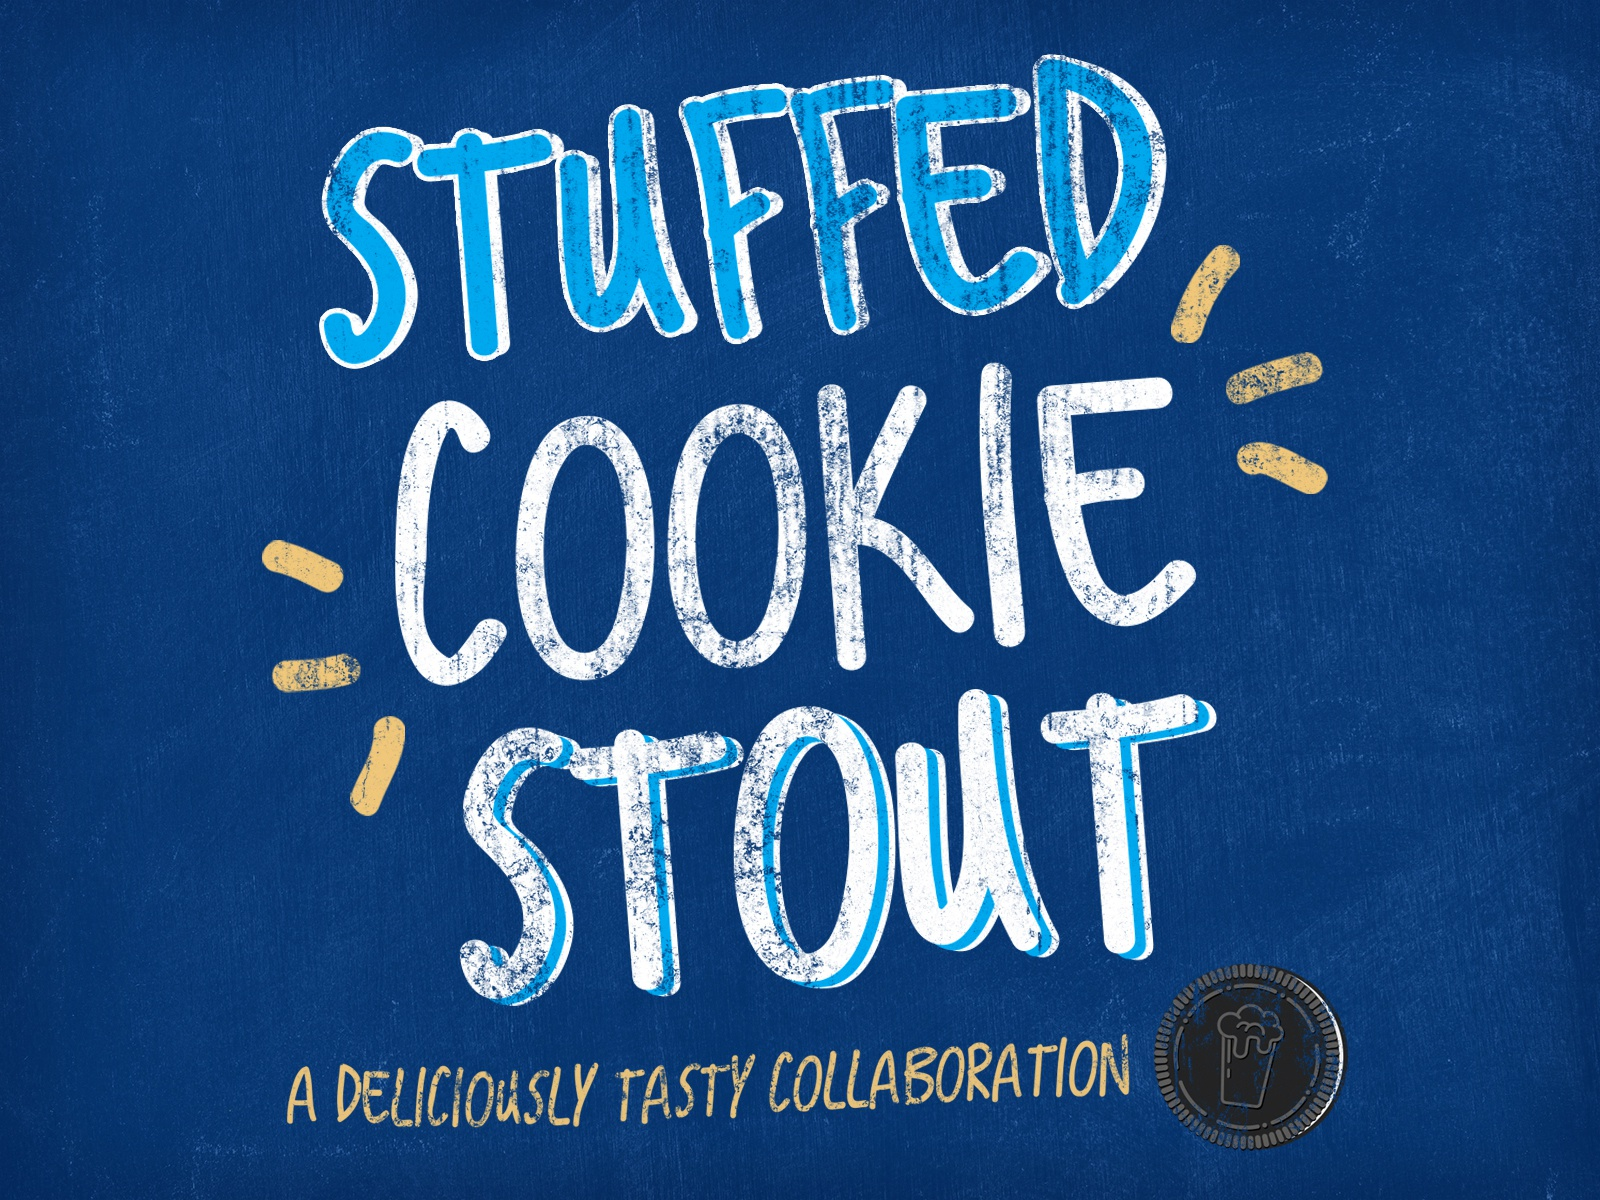 Stuffed cookie stout